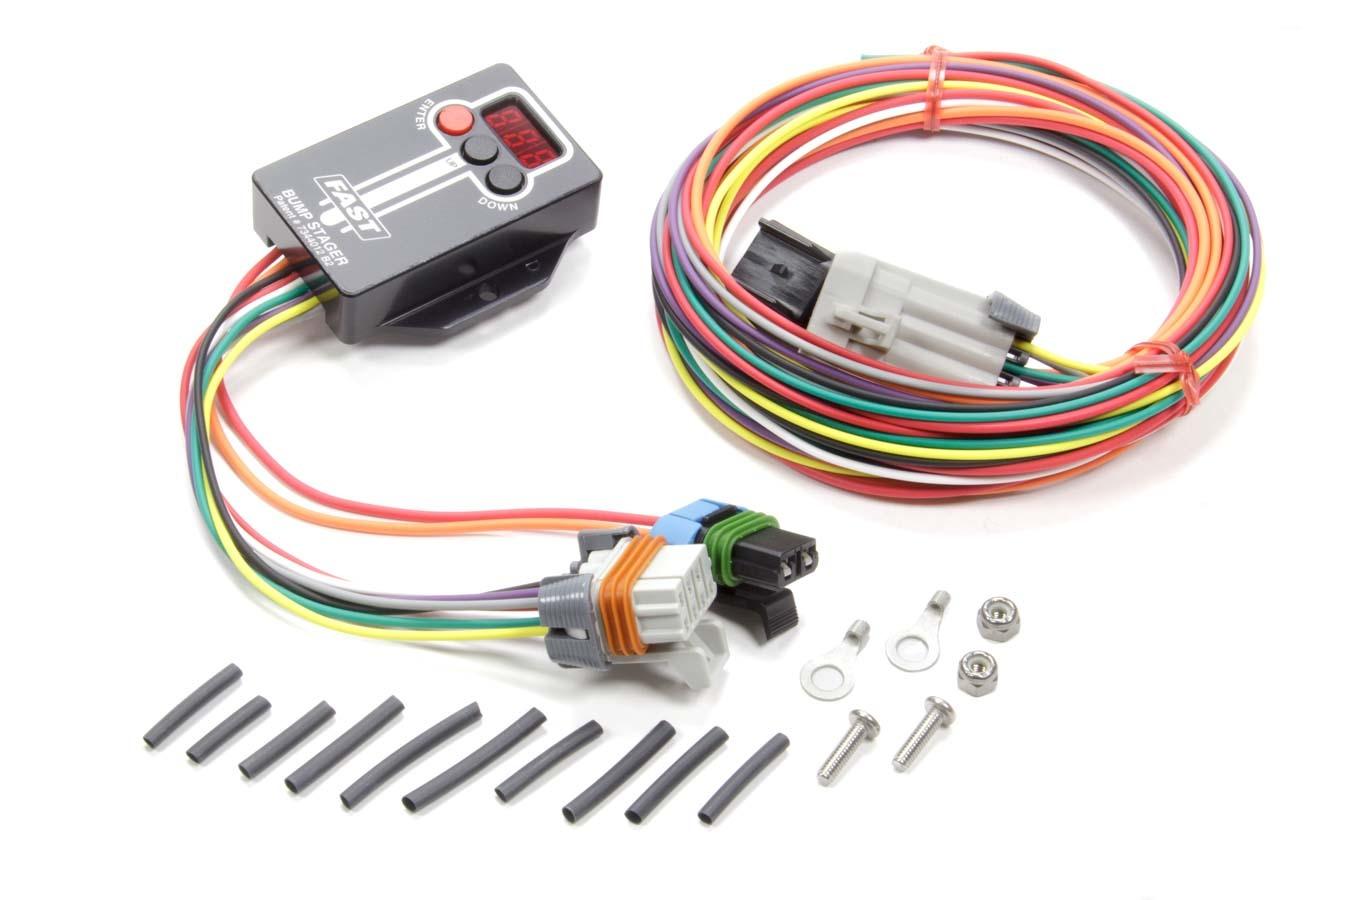 Fast Electronics 30322 Transbrake Controller, Bump Stager, Digital Display / Harness, Universal, Kit